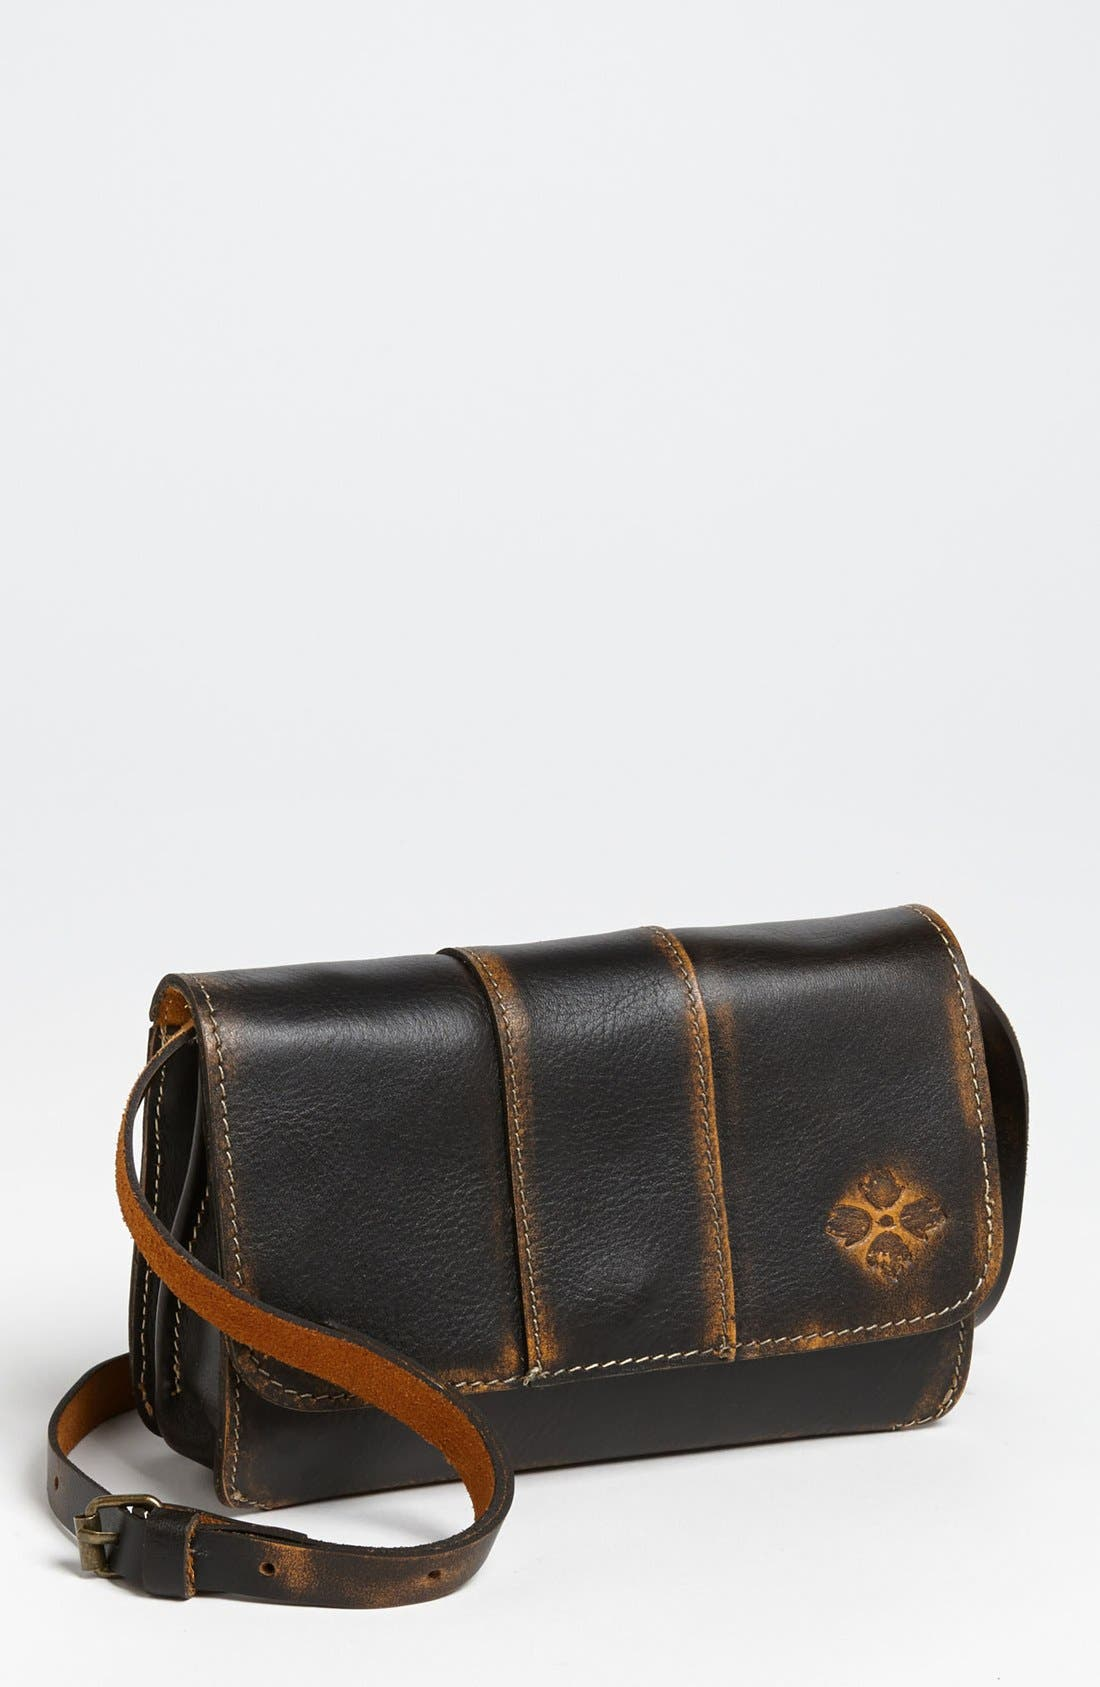 Main Image - Patricia Nash 'Torri Overdye' Crossbody Bag